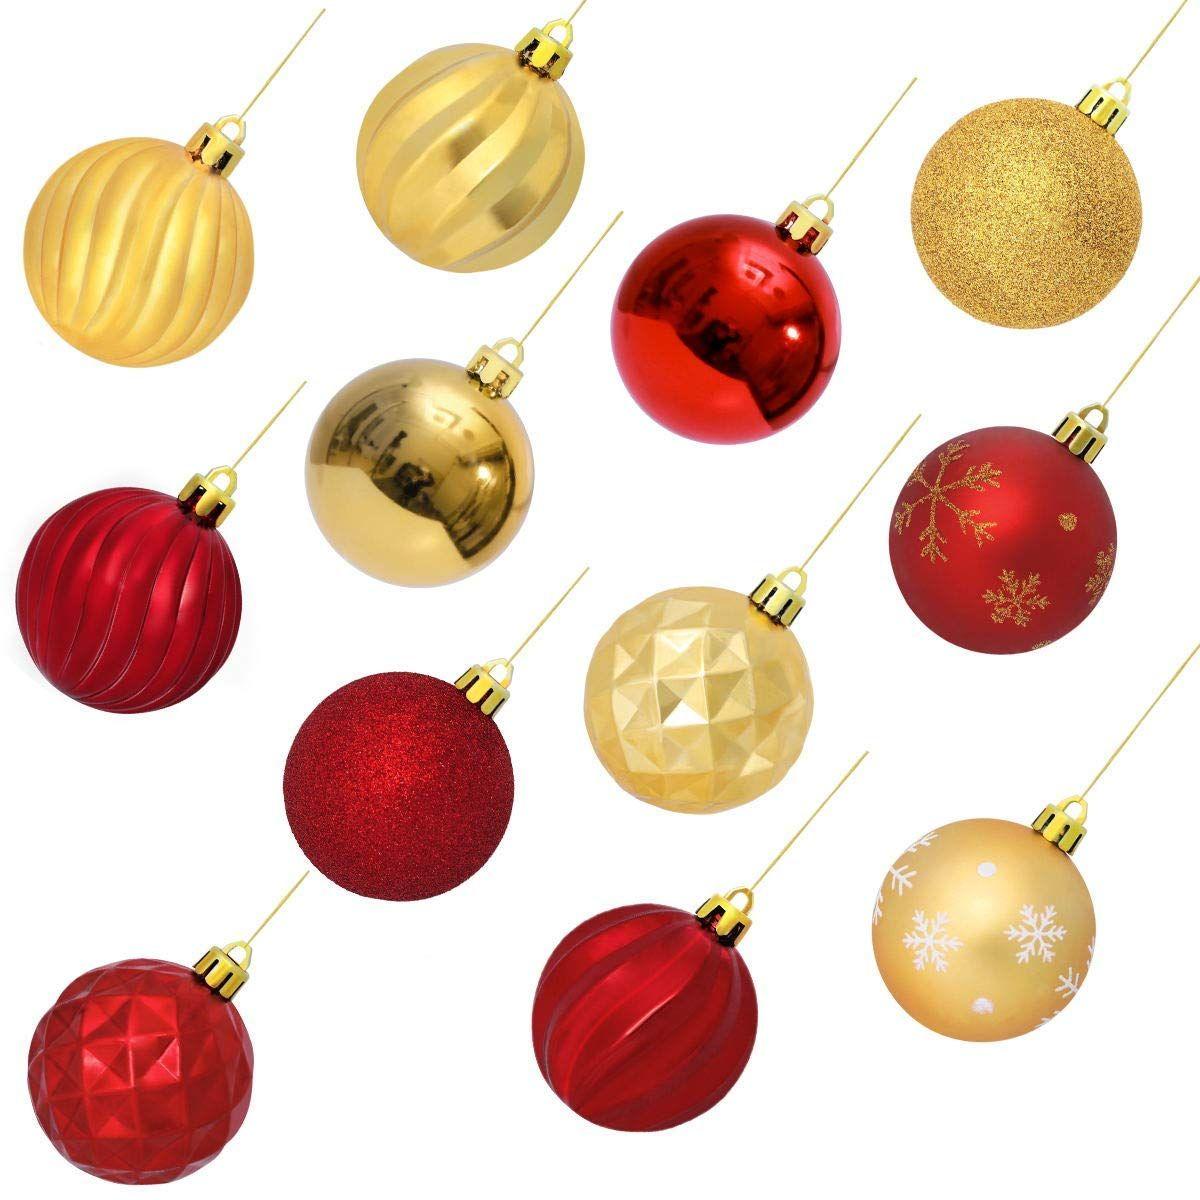 Amazon Com Unomor 24pcs Christmas Ball Ornaments Christmas Decoration Tree Balls For Holi Christmas Decorations Tree Holiday Party Decorations Ball Ornaments